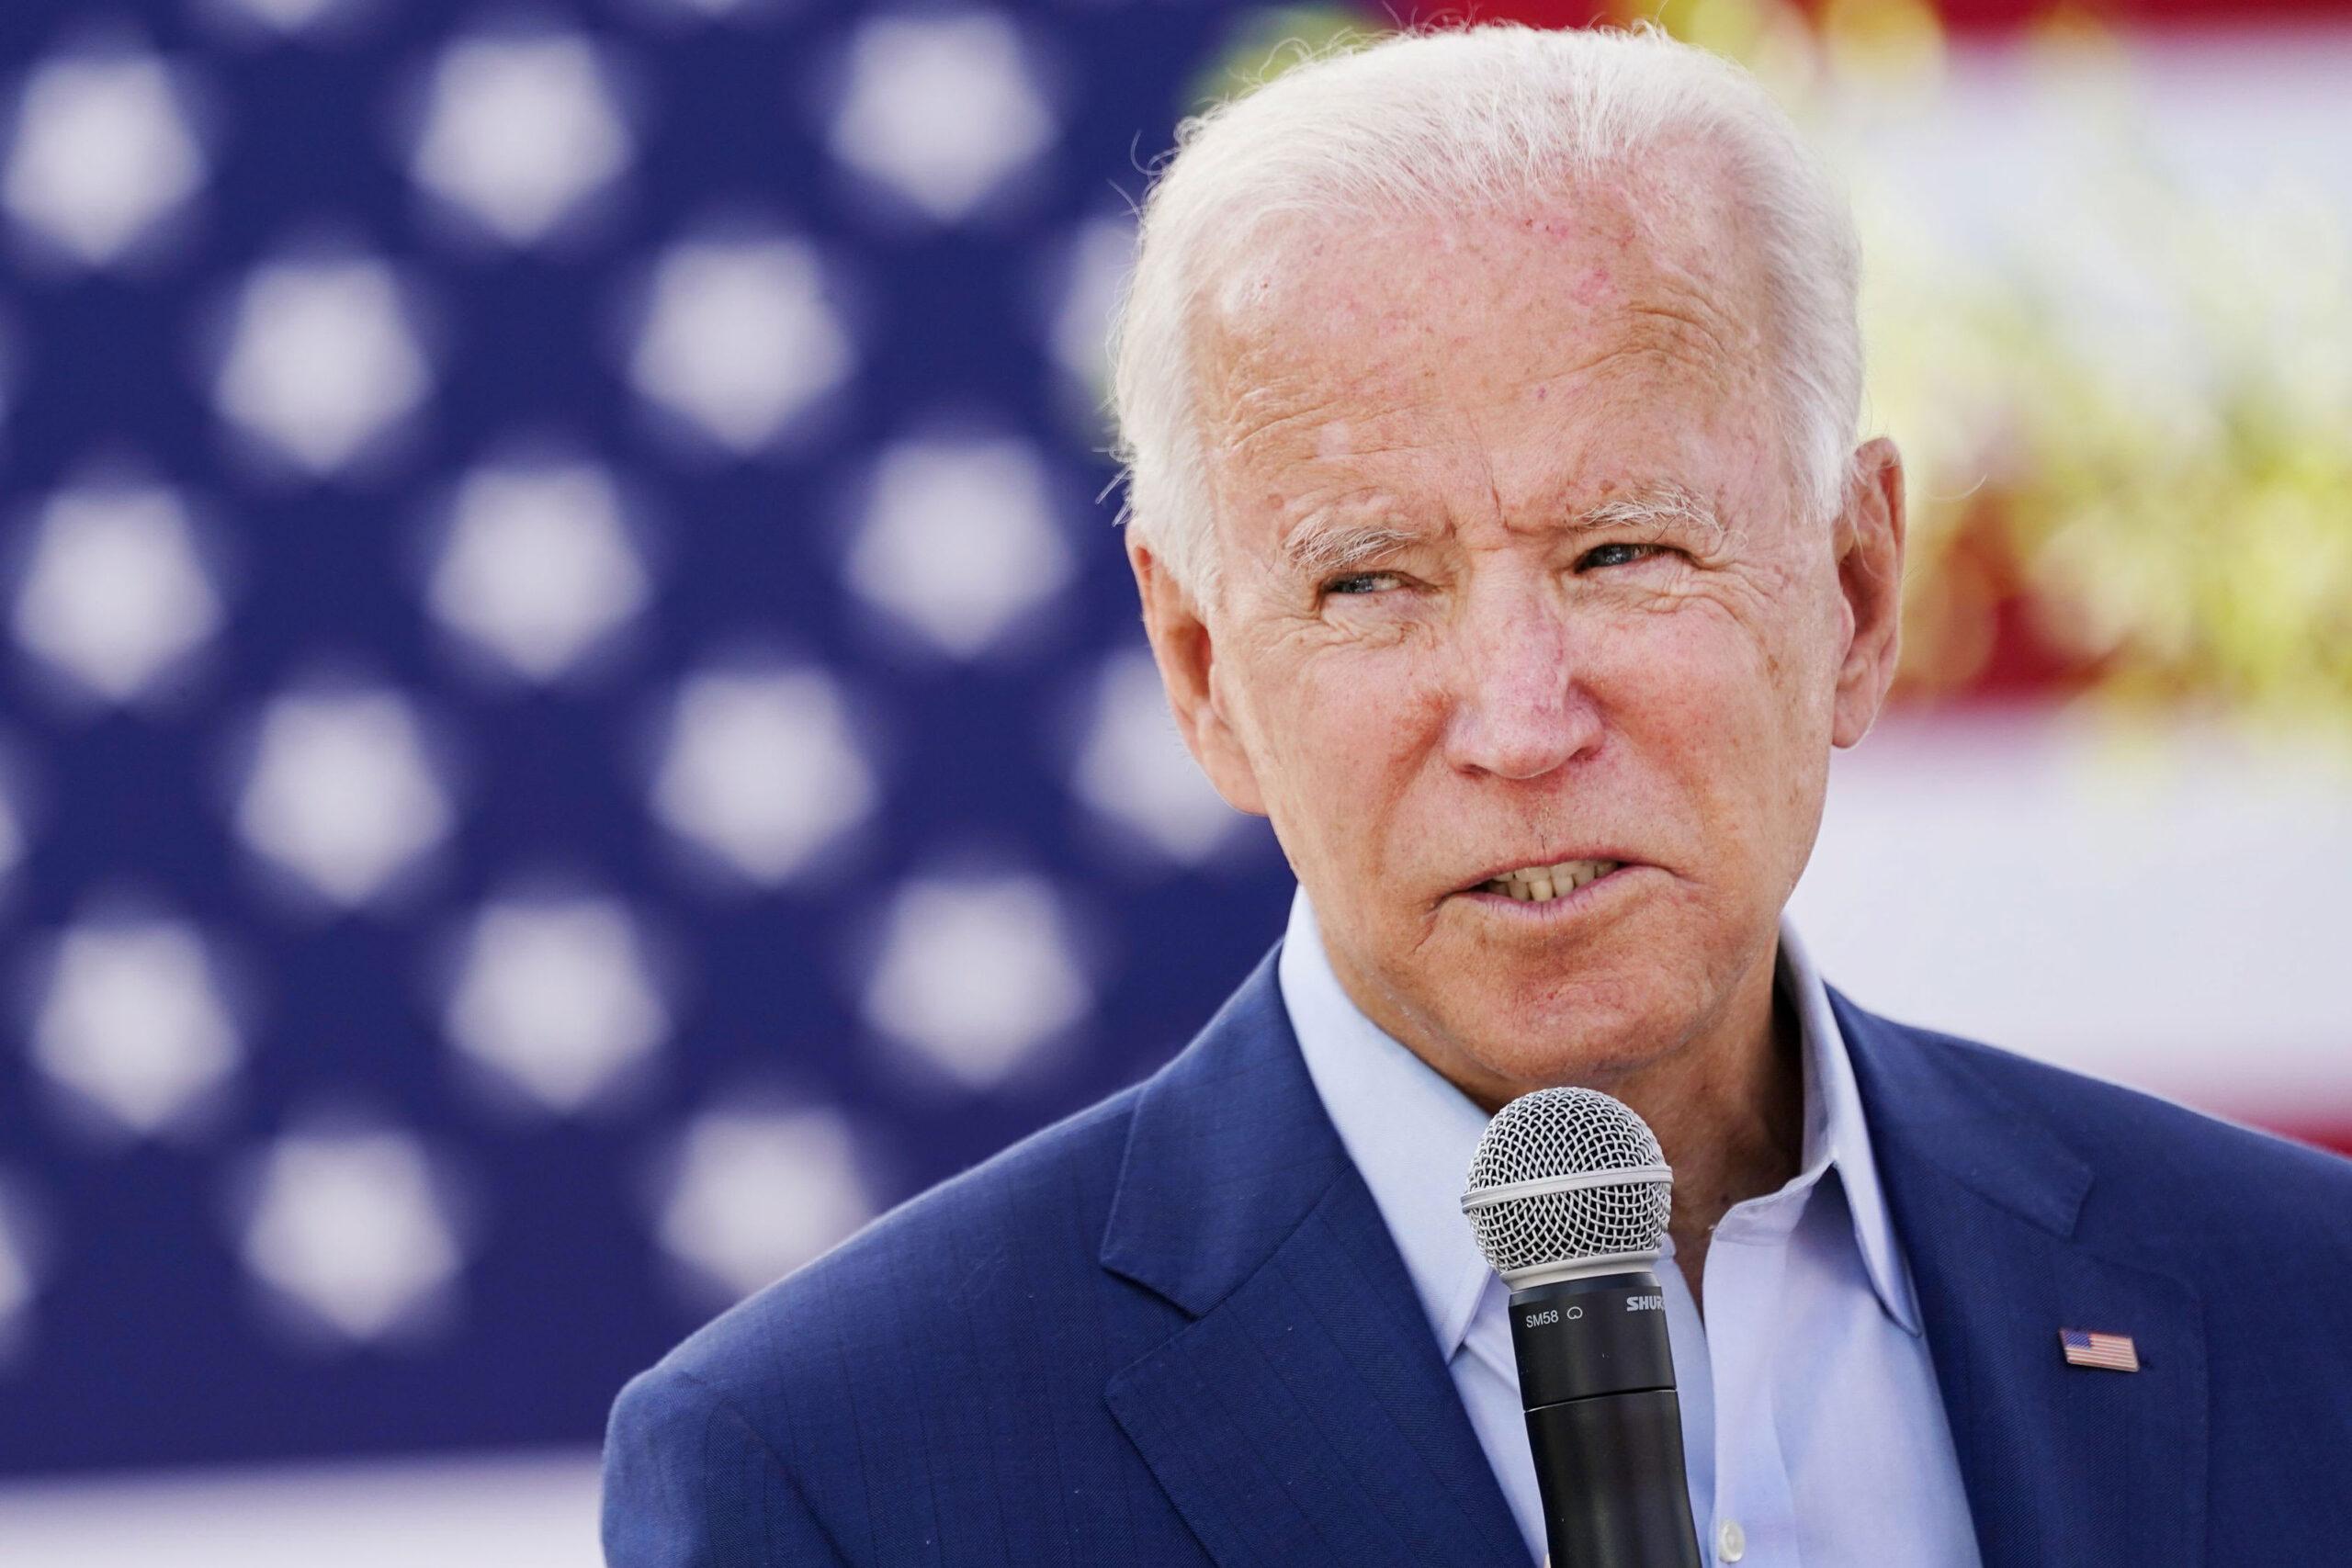 Hoping to win but not announcing victory: Joe Biden